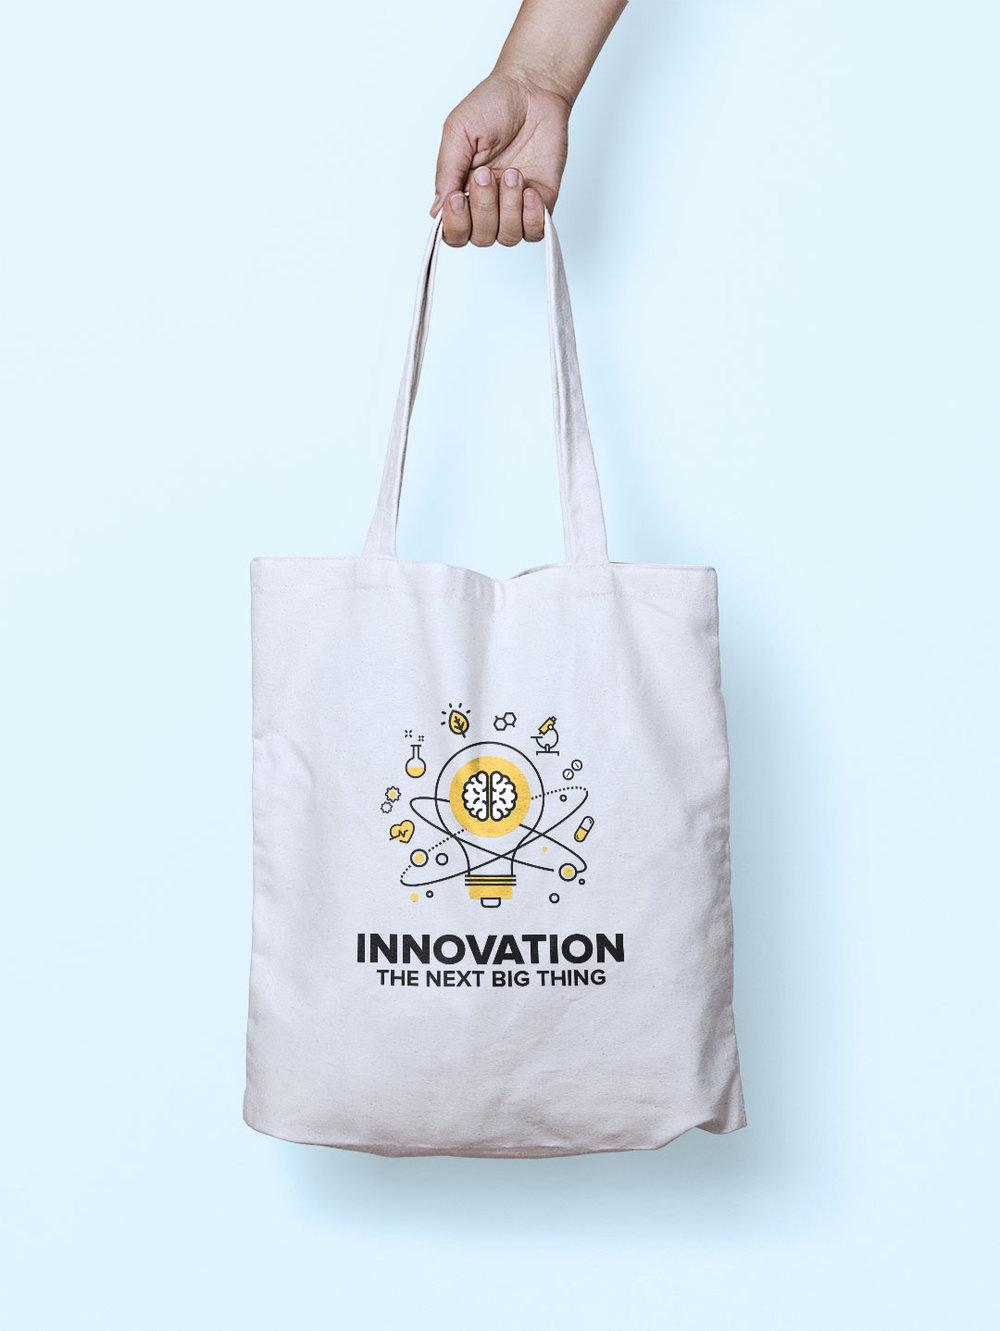 Innovation | Tote bag graphic design Manly, Sydney